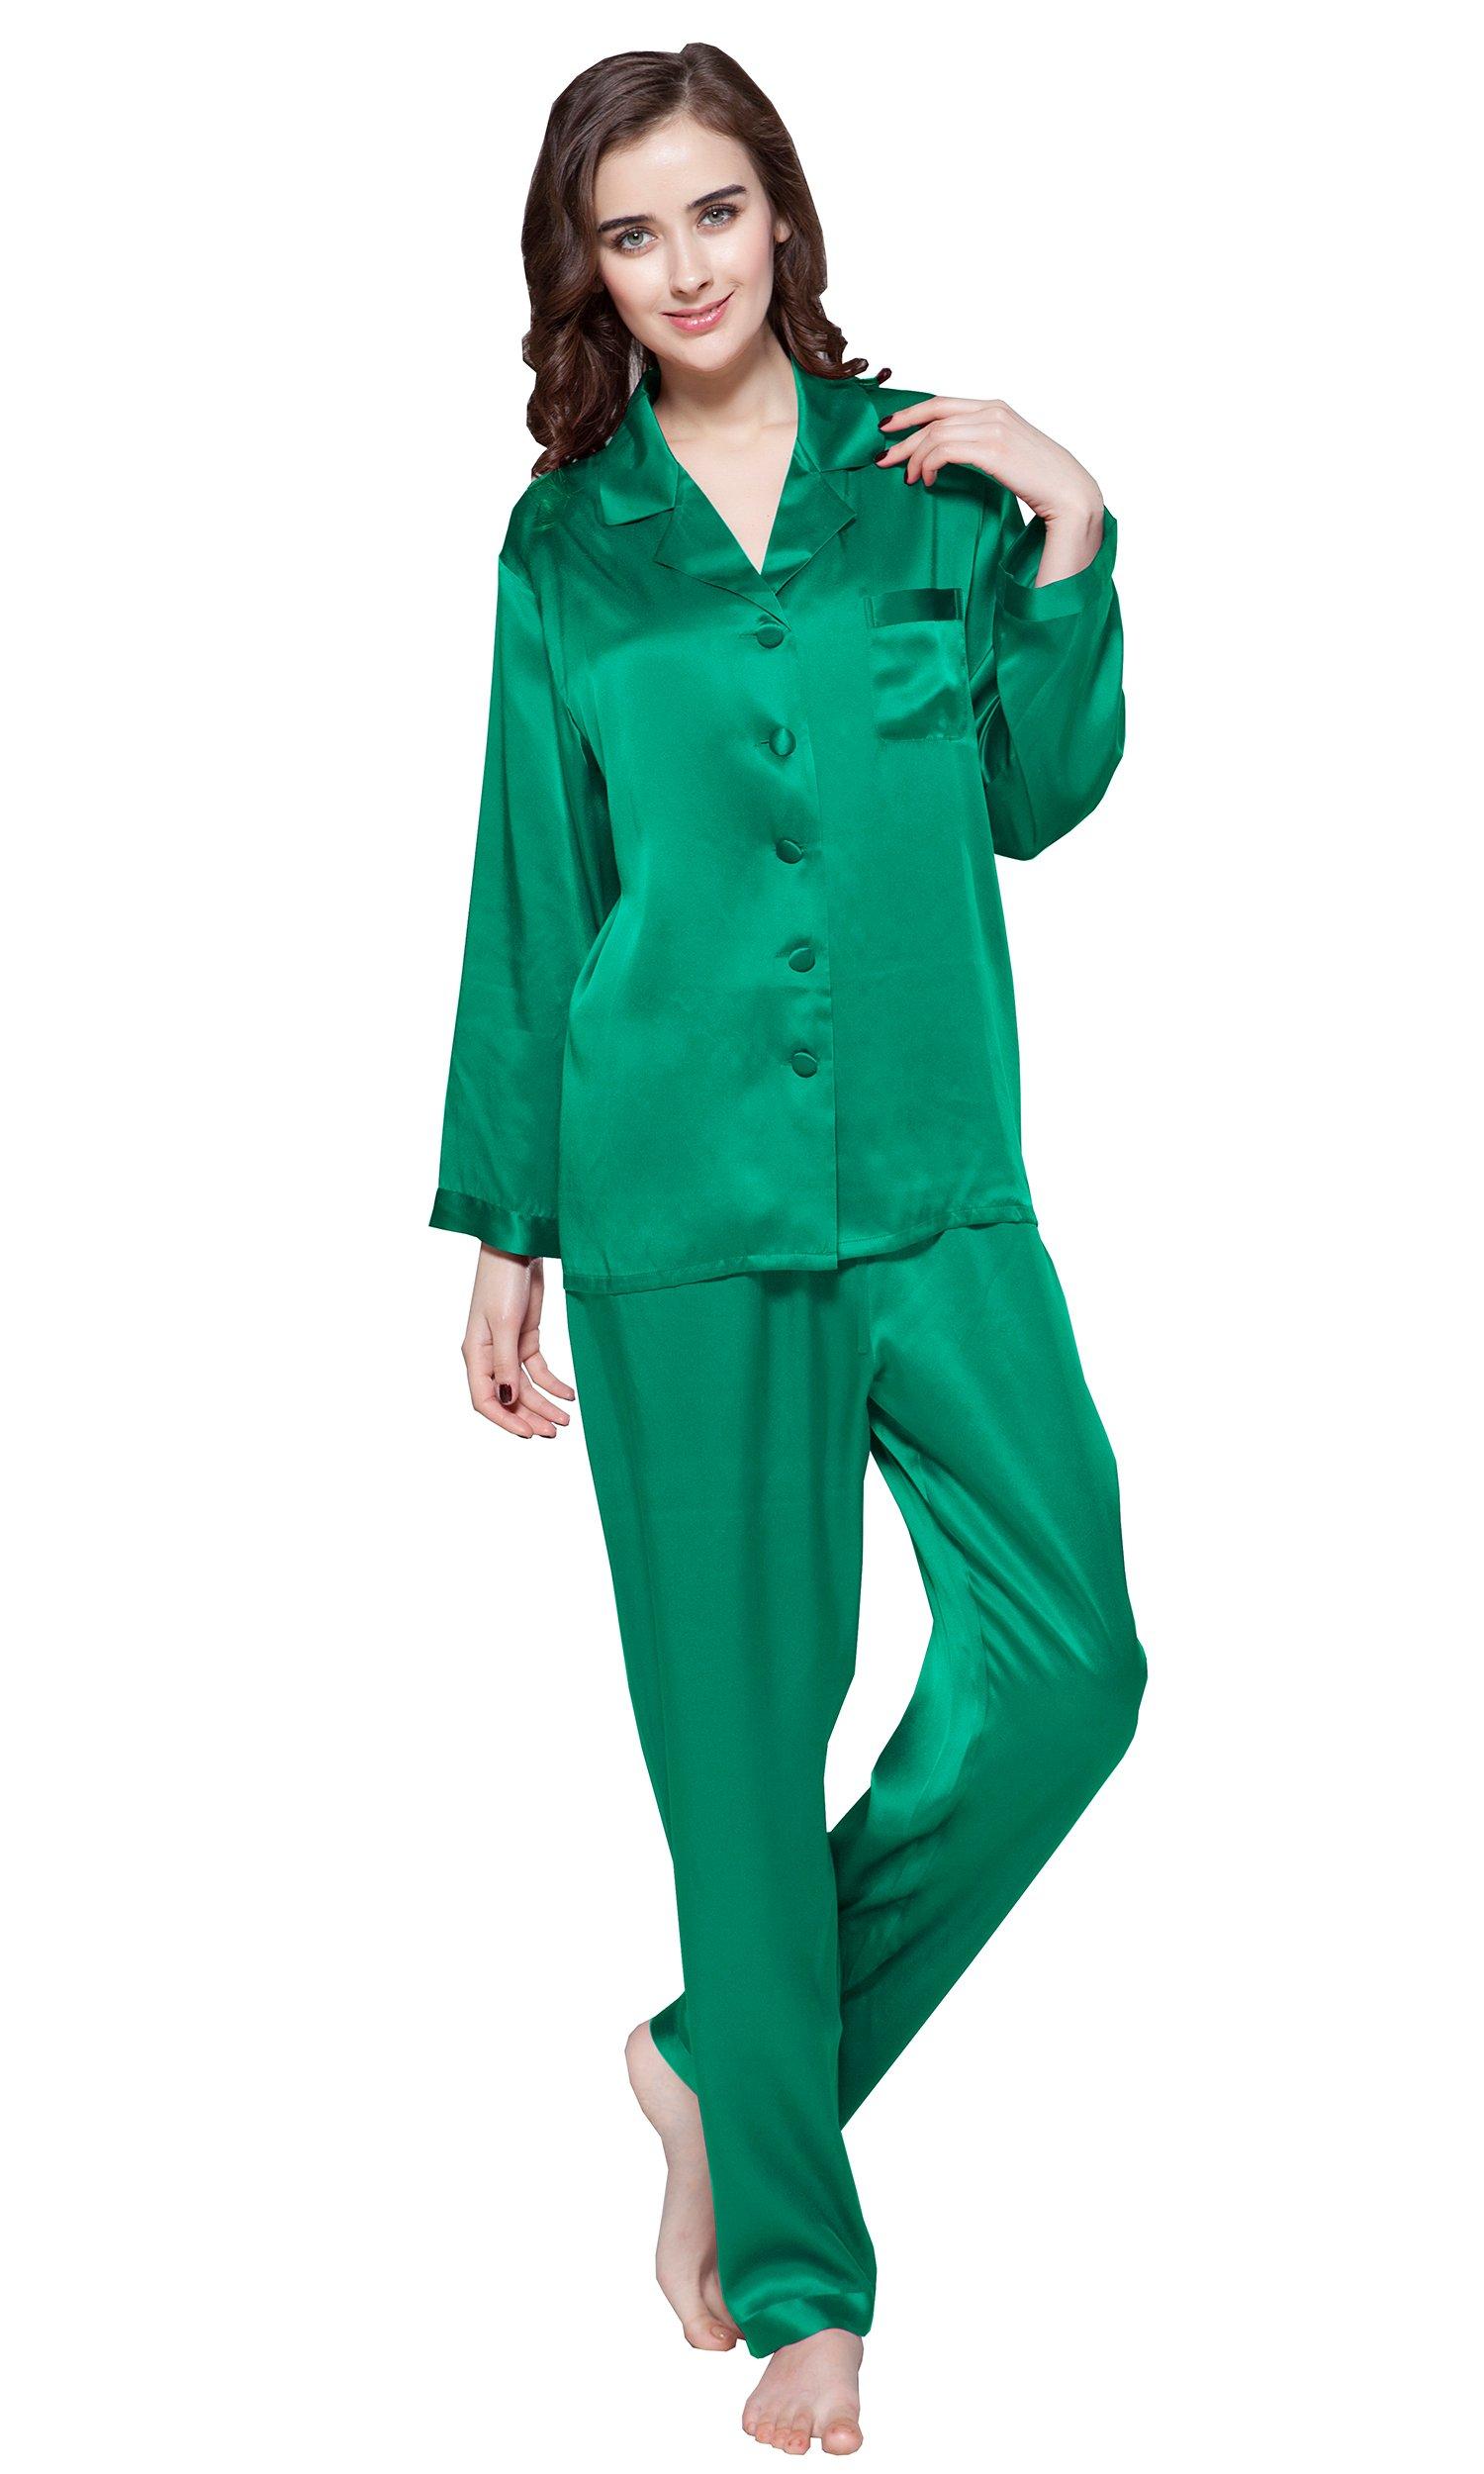 LILYSILK Women's Pure Silk Pajamas Full Length Long 22 Momme 100% Mulberry Silk Christmas Gift (8-10/Medium, Green Jade)